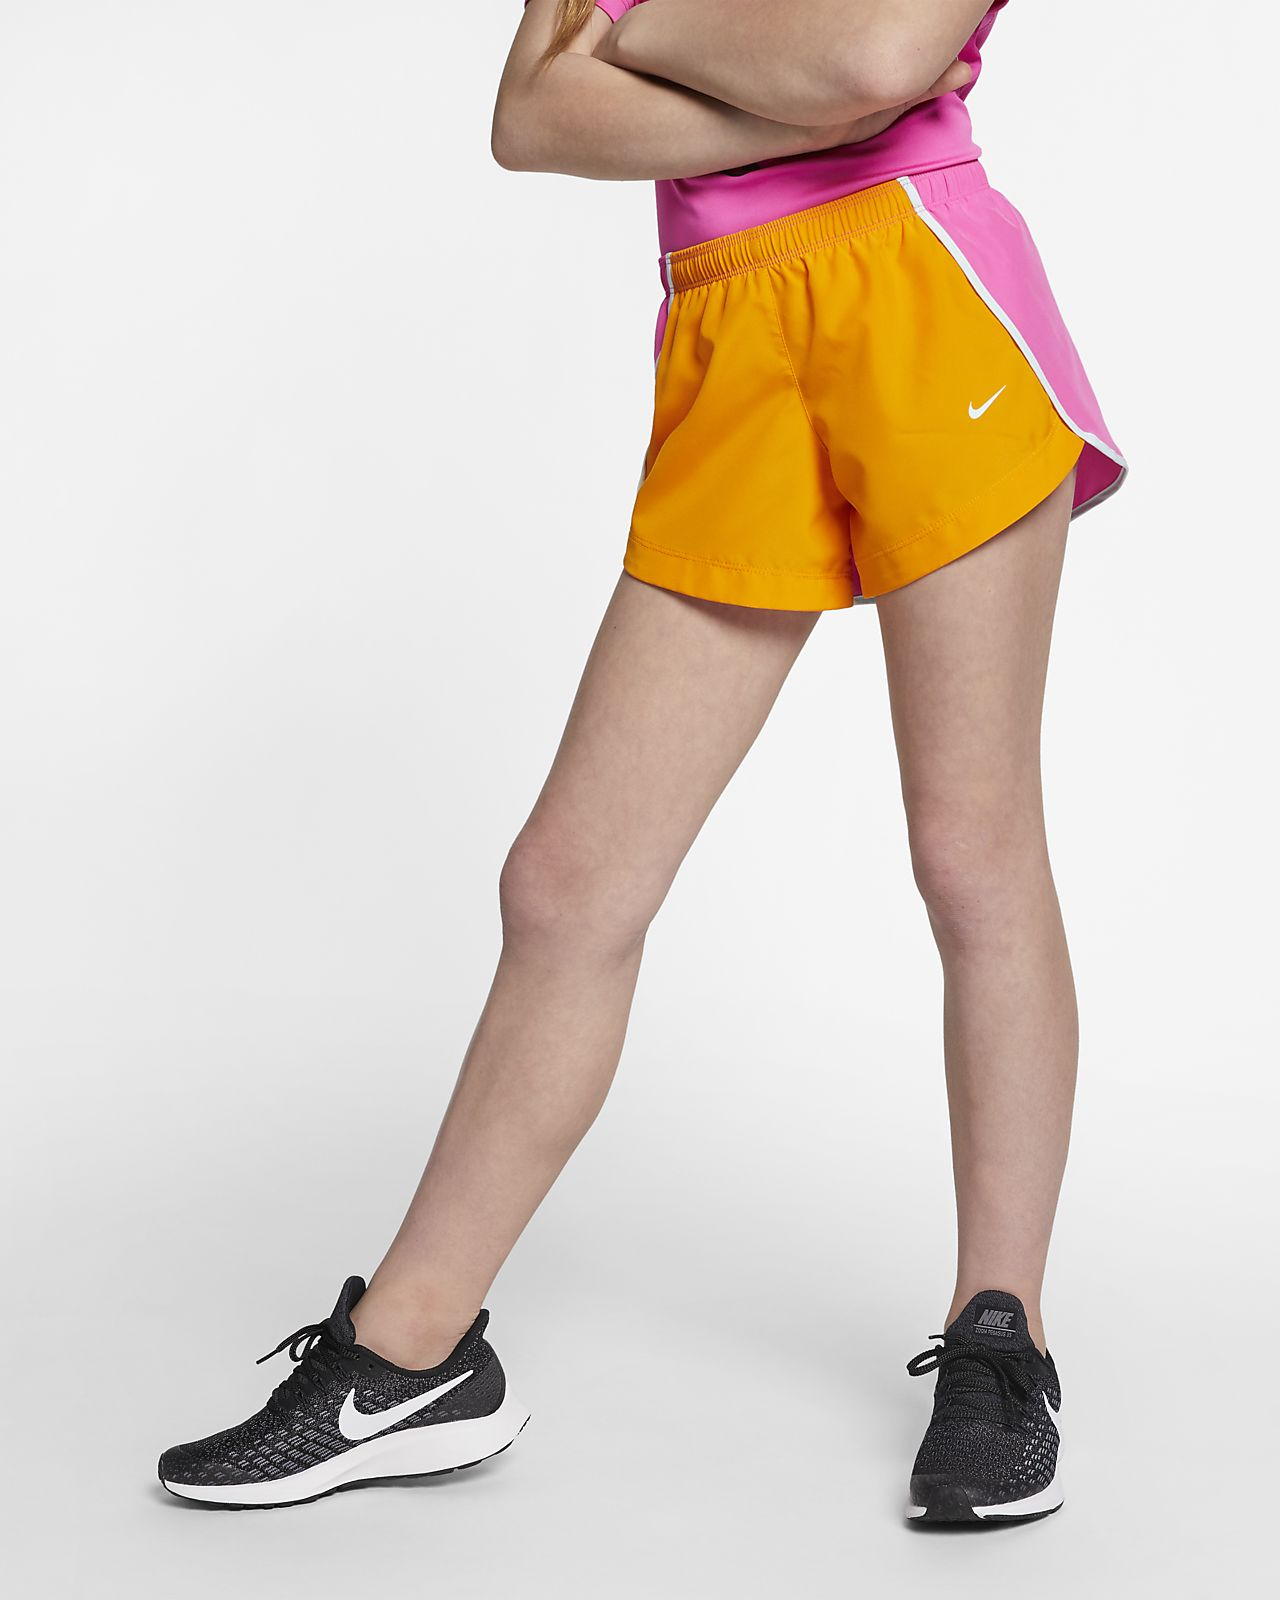 Löparshorts Nike Dri-FIT Run 7,5 cm för tjejer